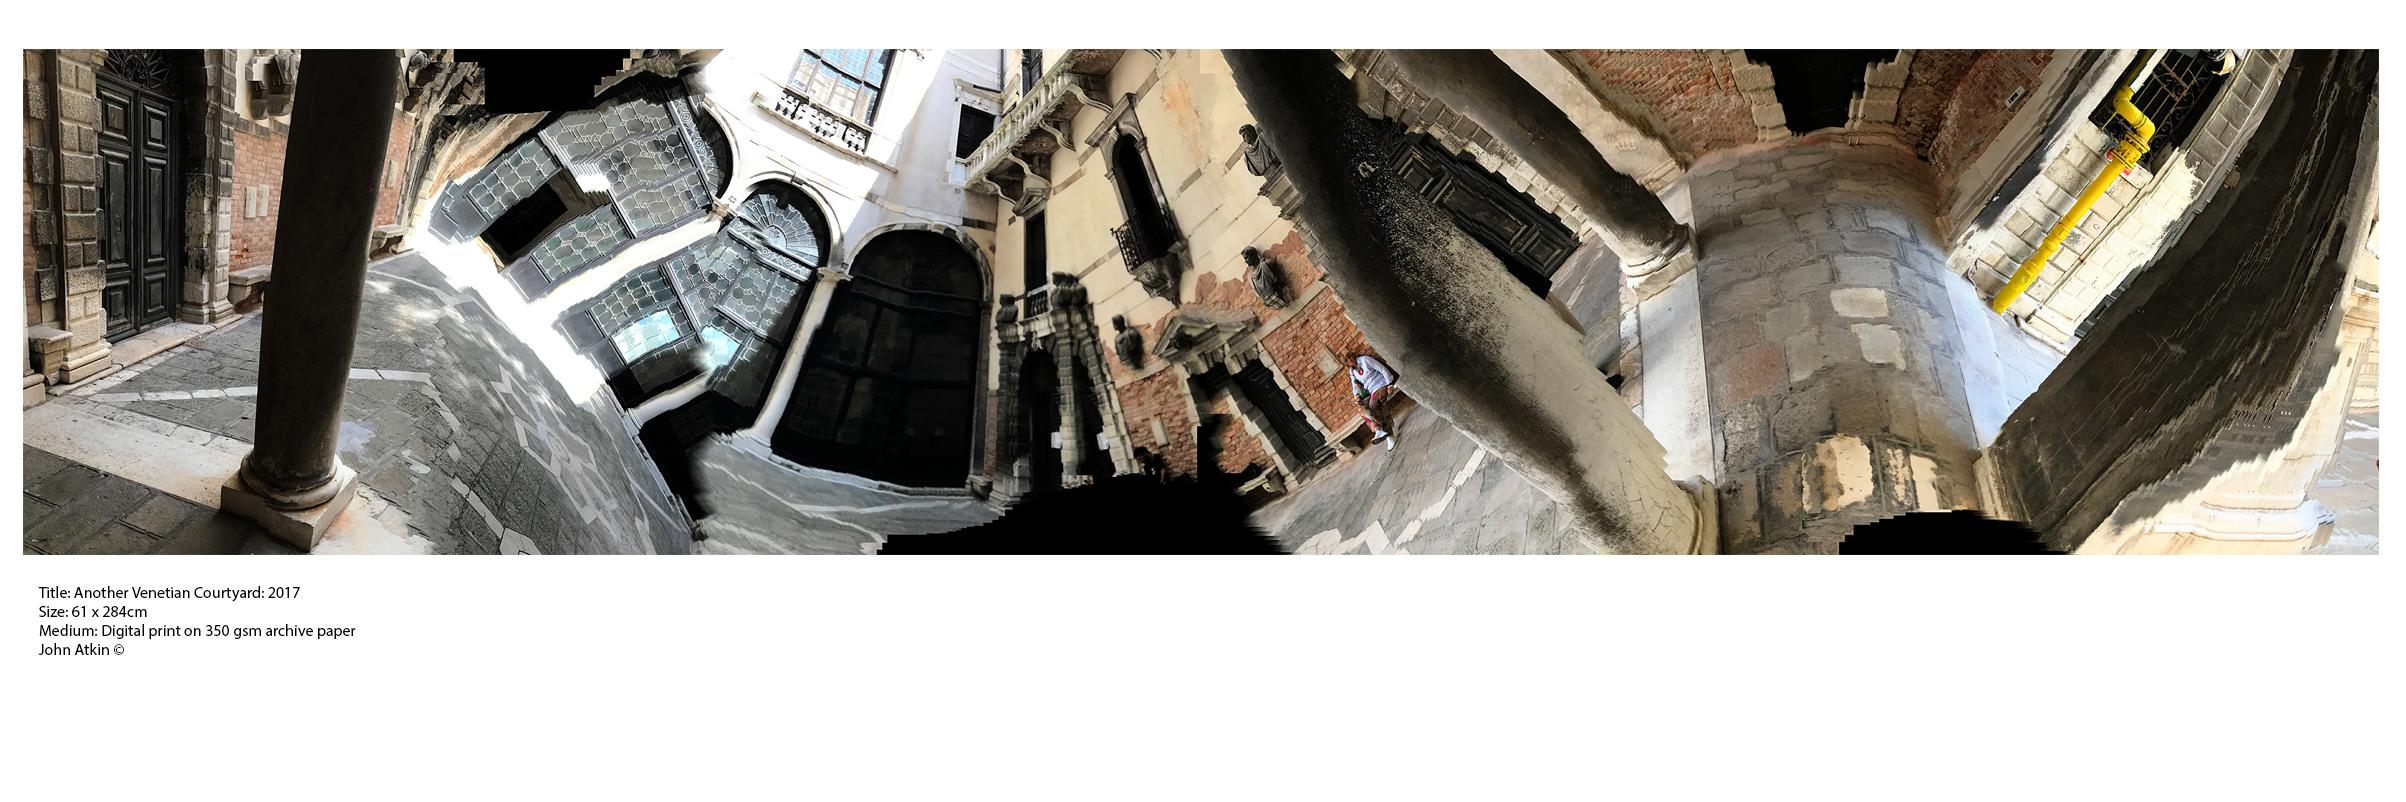 Another Venetian Courtyard: 2017